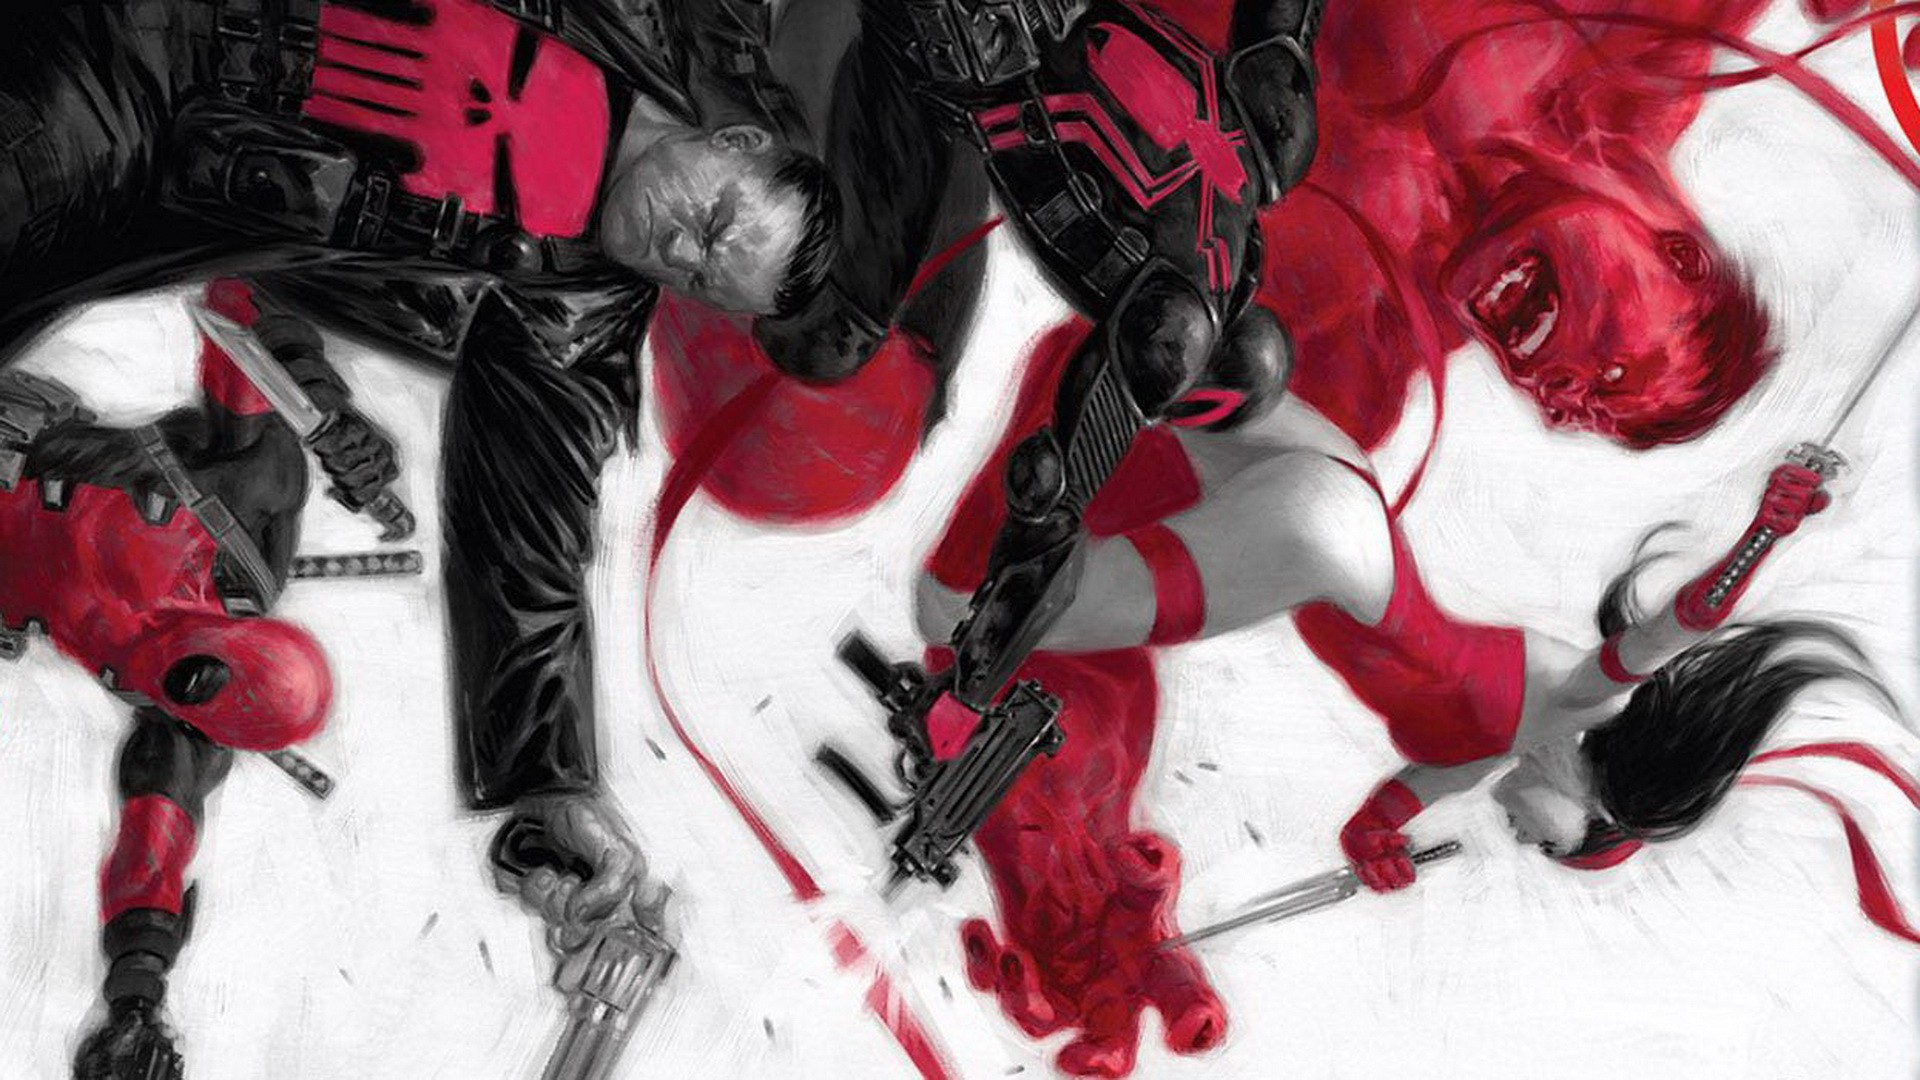 comics venom elektra deadpool wade wilson the punisher marvel comics 1920x1080